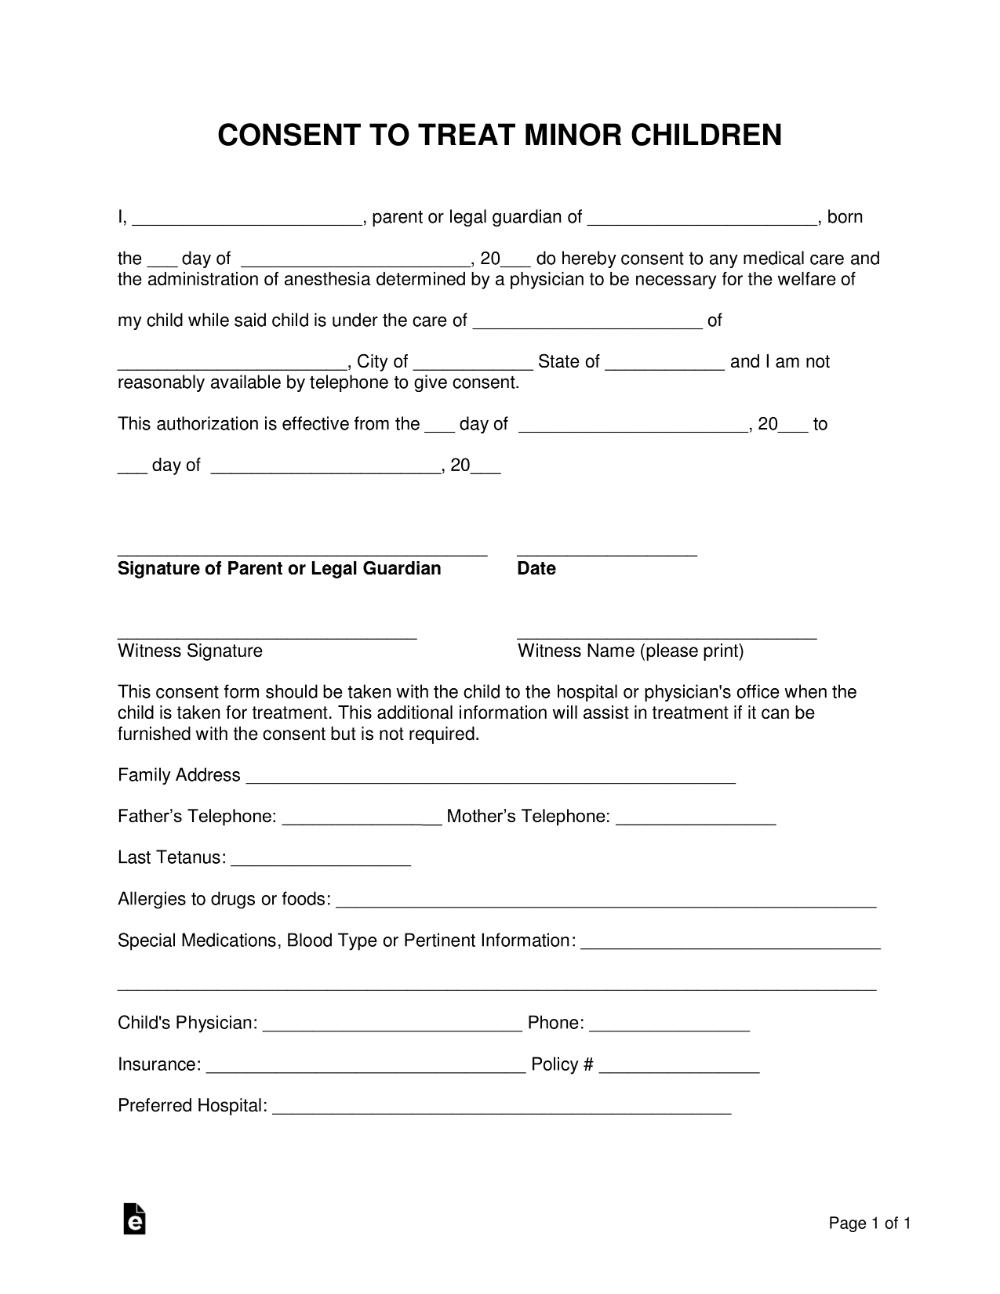 Free Minor Child Medical Consent Form Word Pdf Eforms Free Fillable Forms Children S Medical Consent Forms Medical Consent Form Children